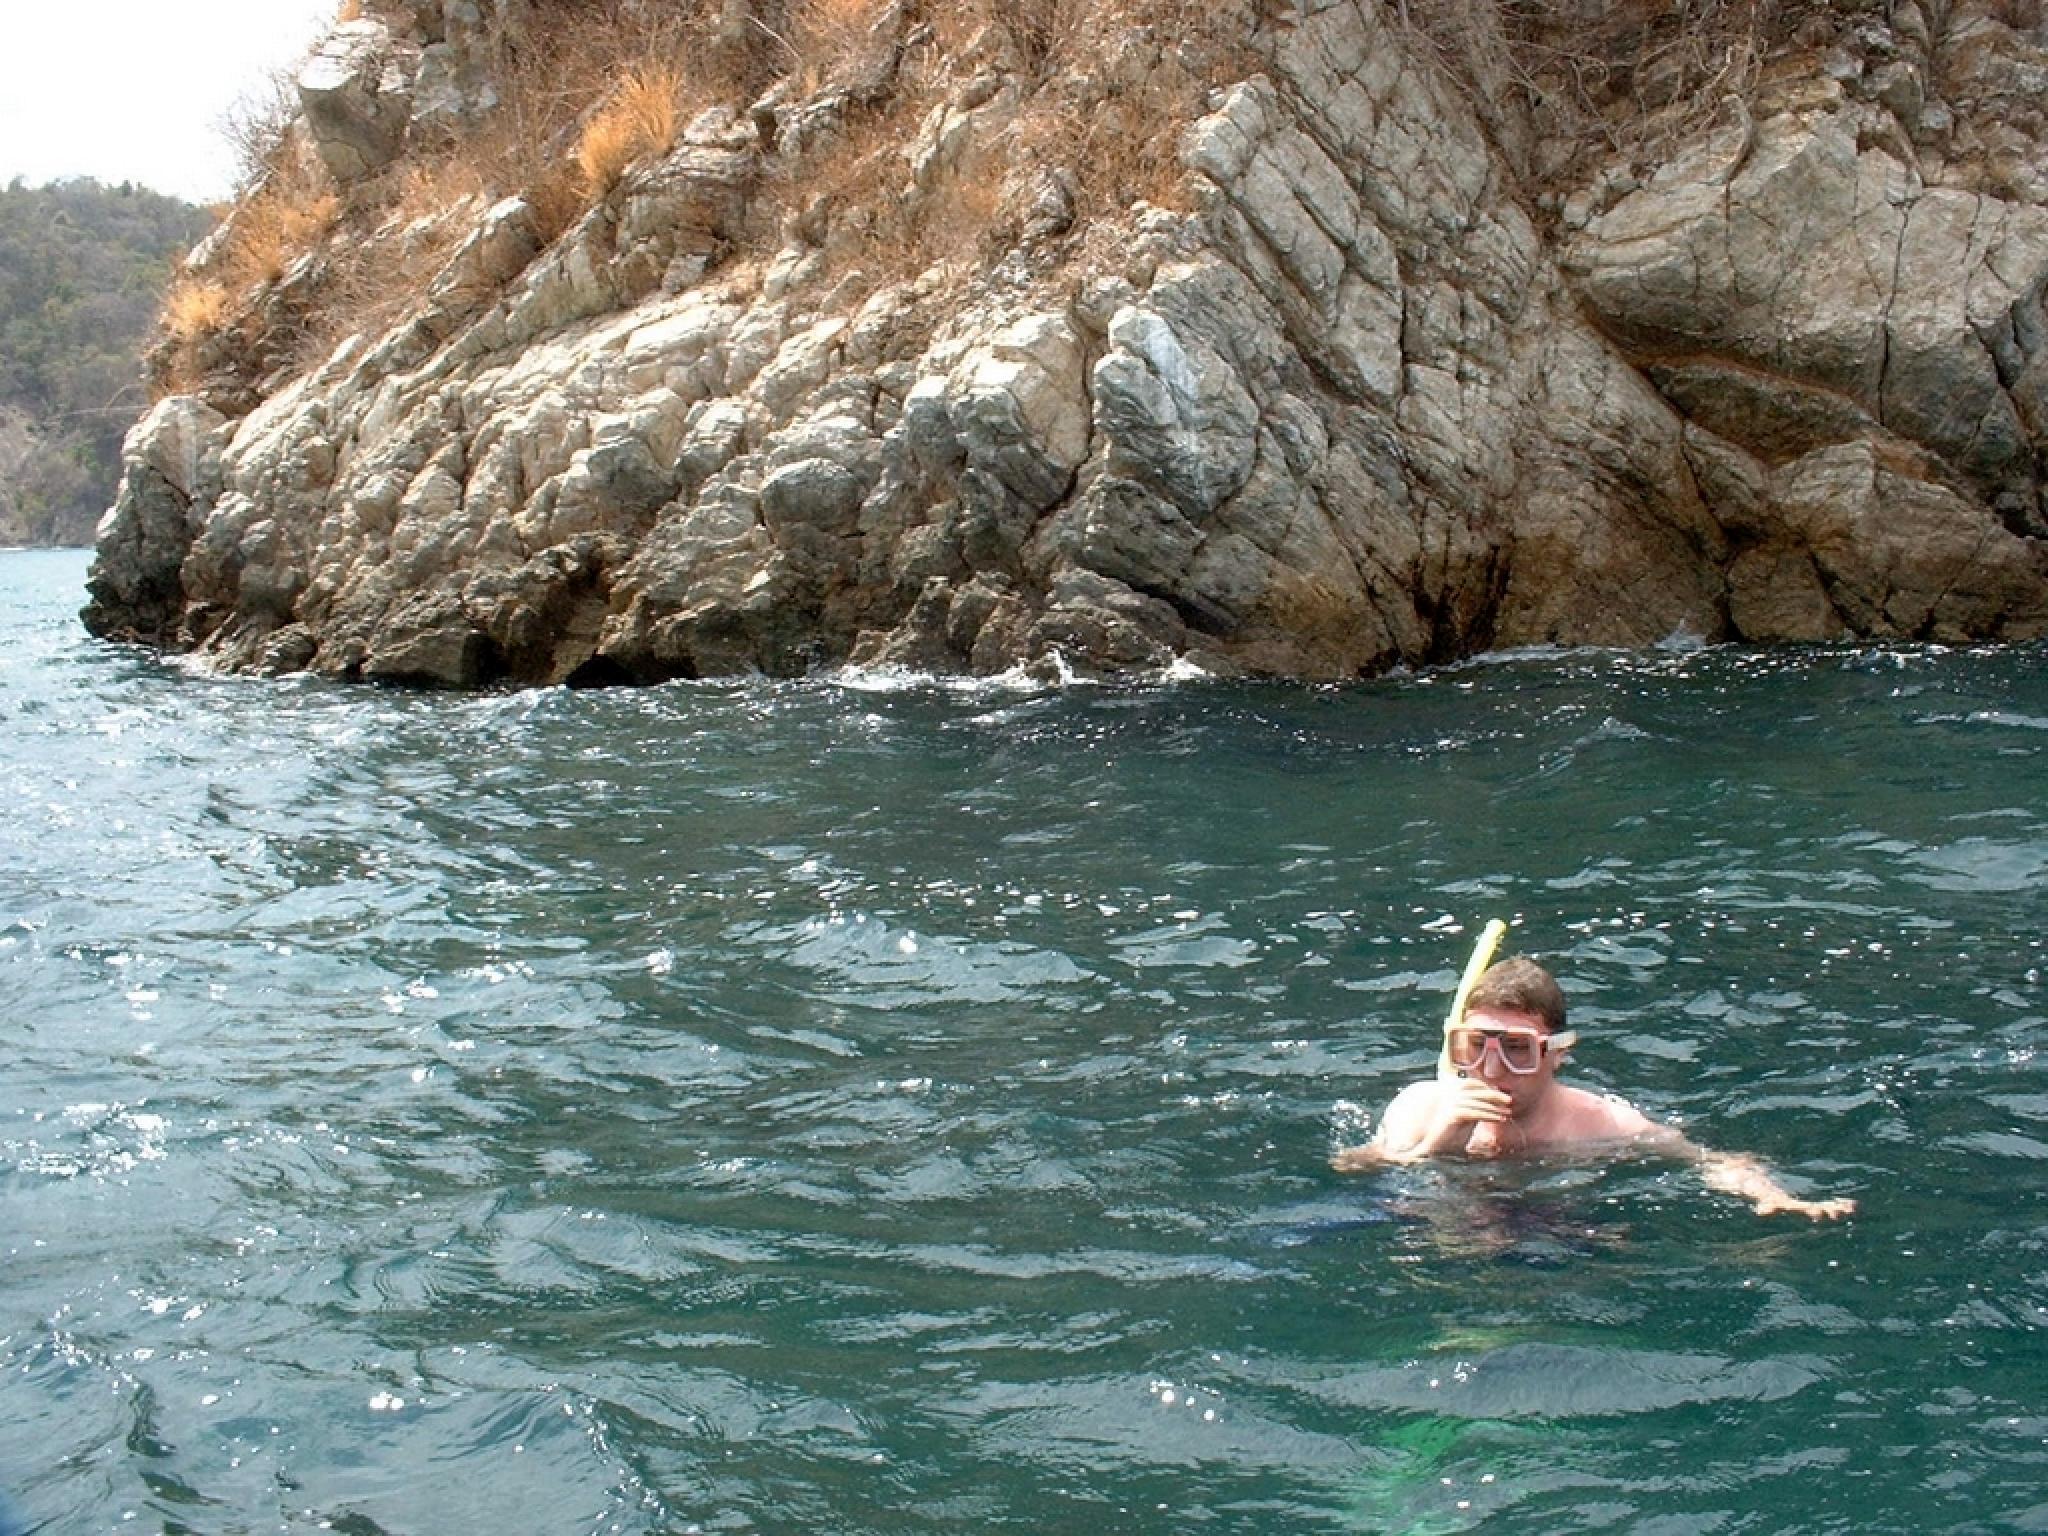 Snorkeling Tour at Marino Ballena National Park